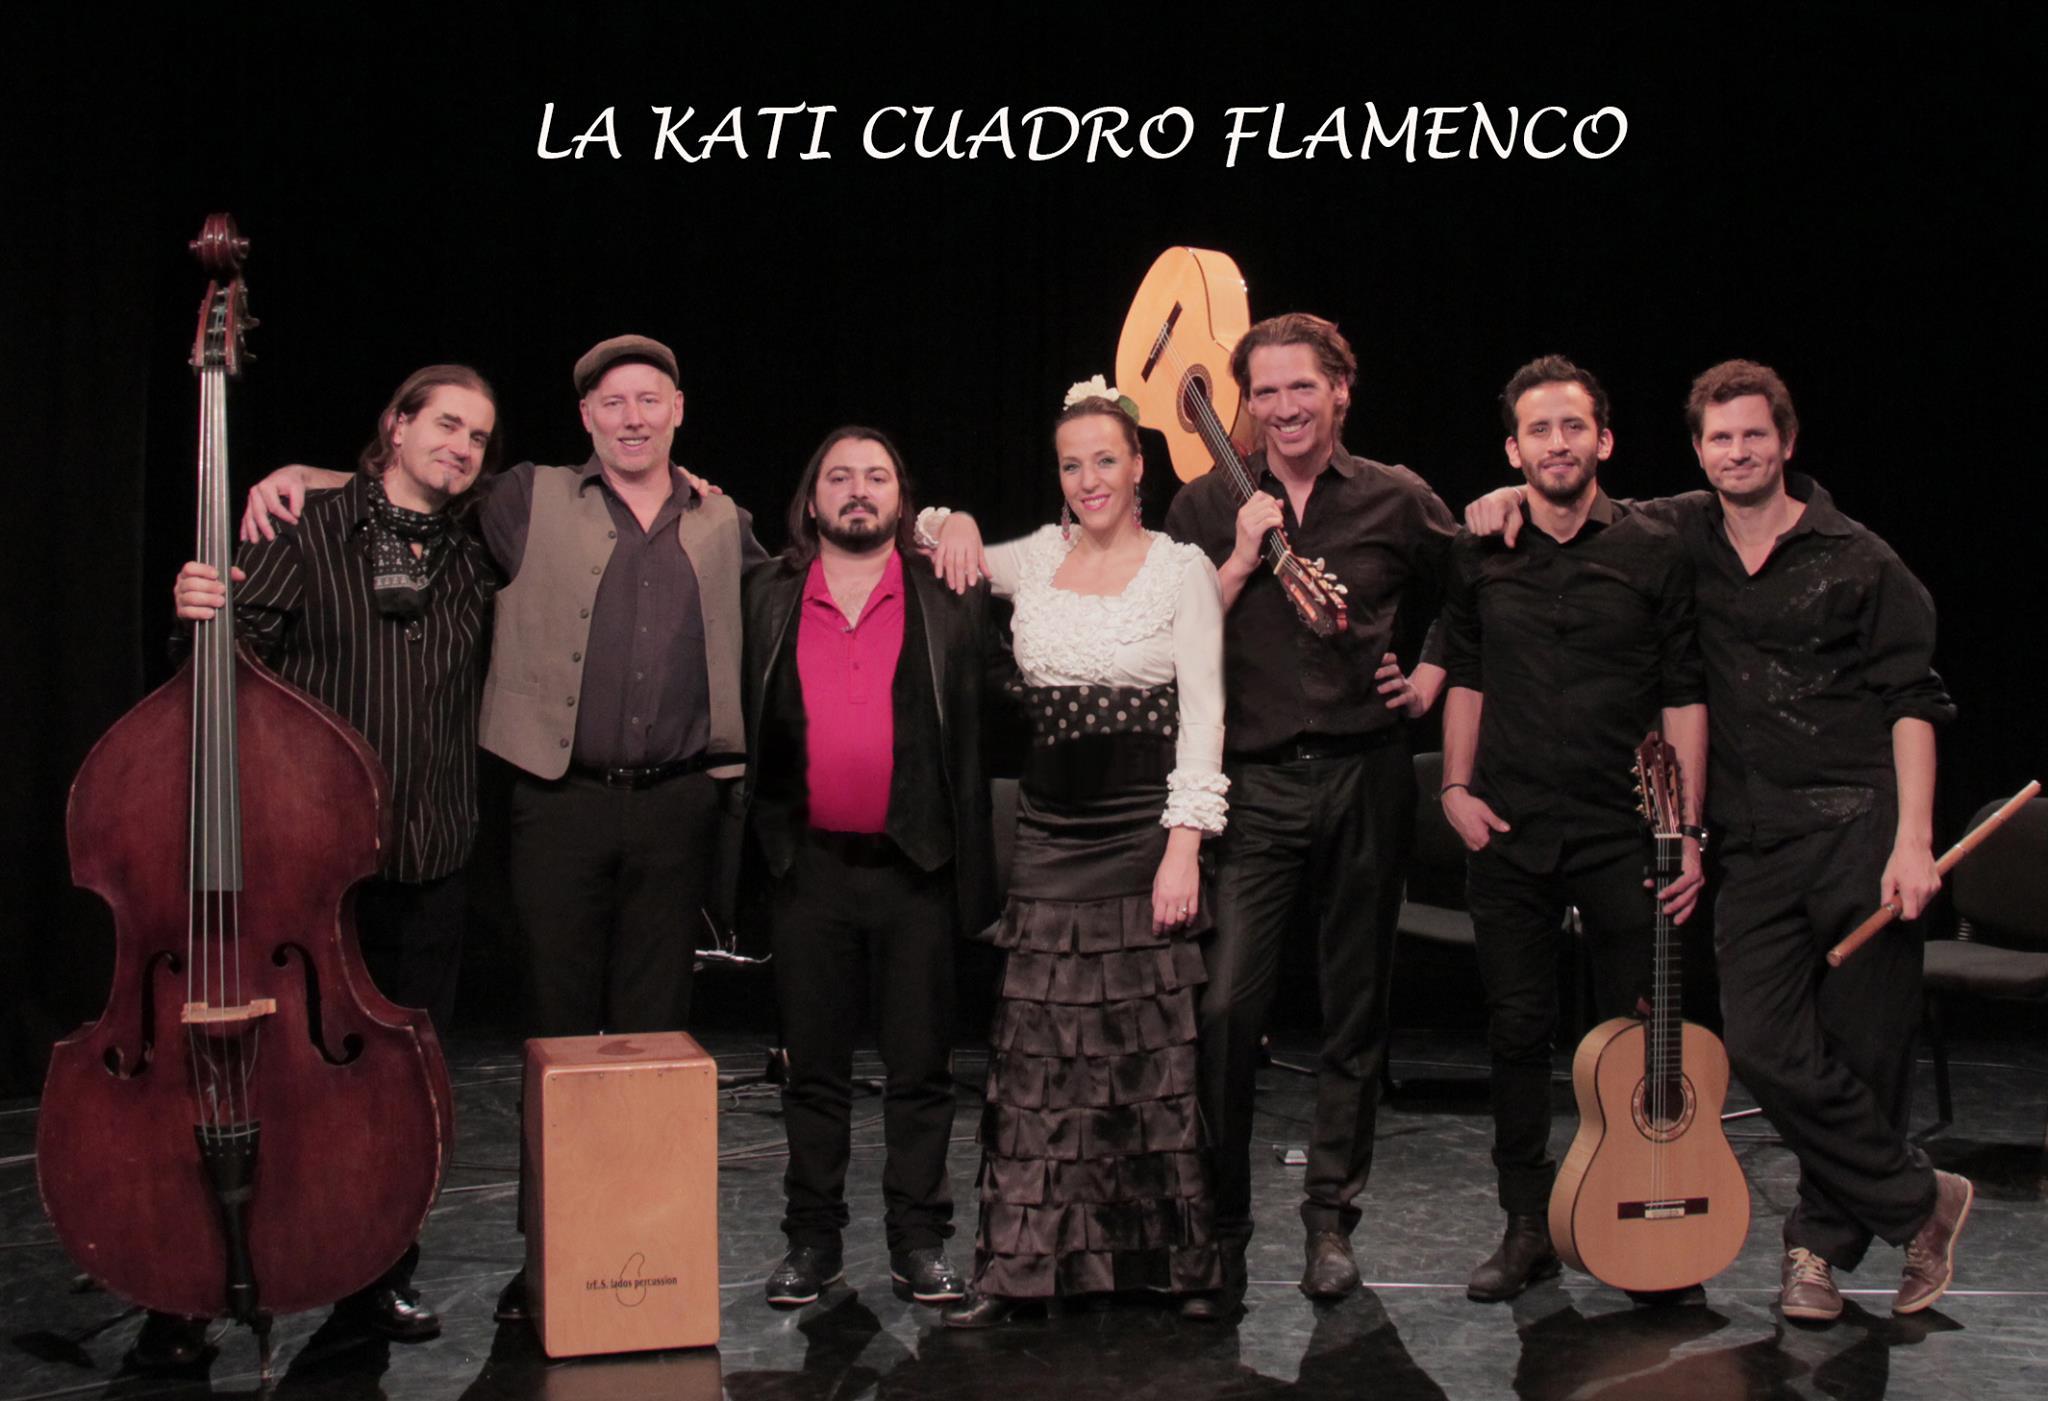 La Kati Cuadro Flamenco